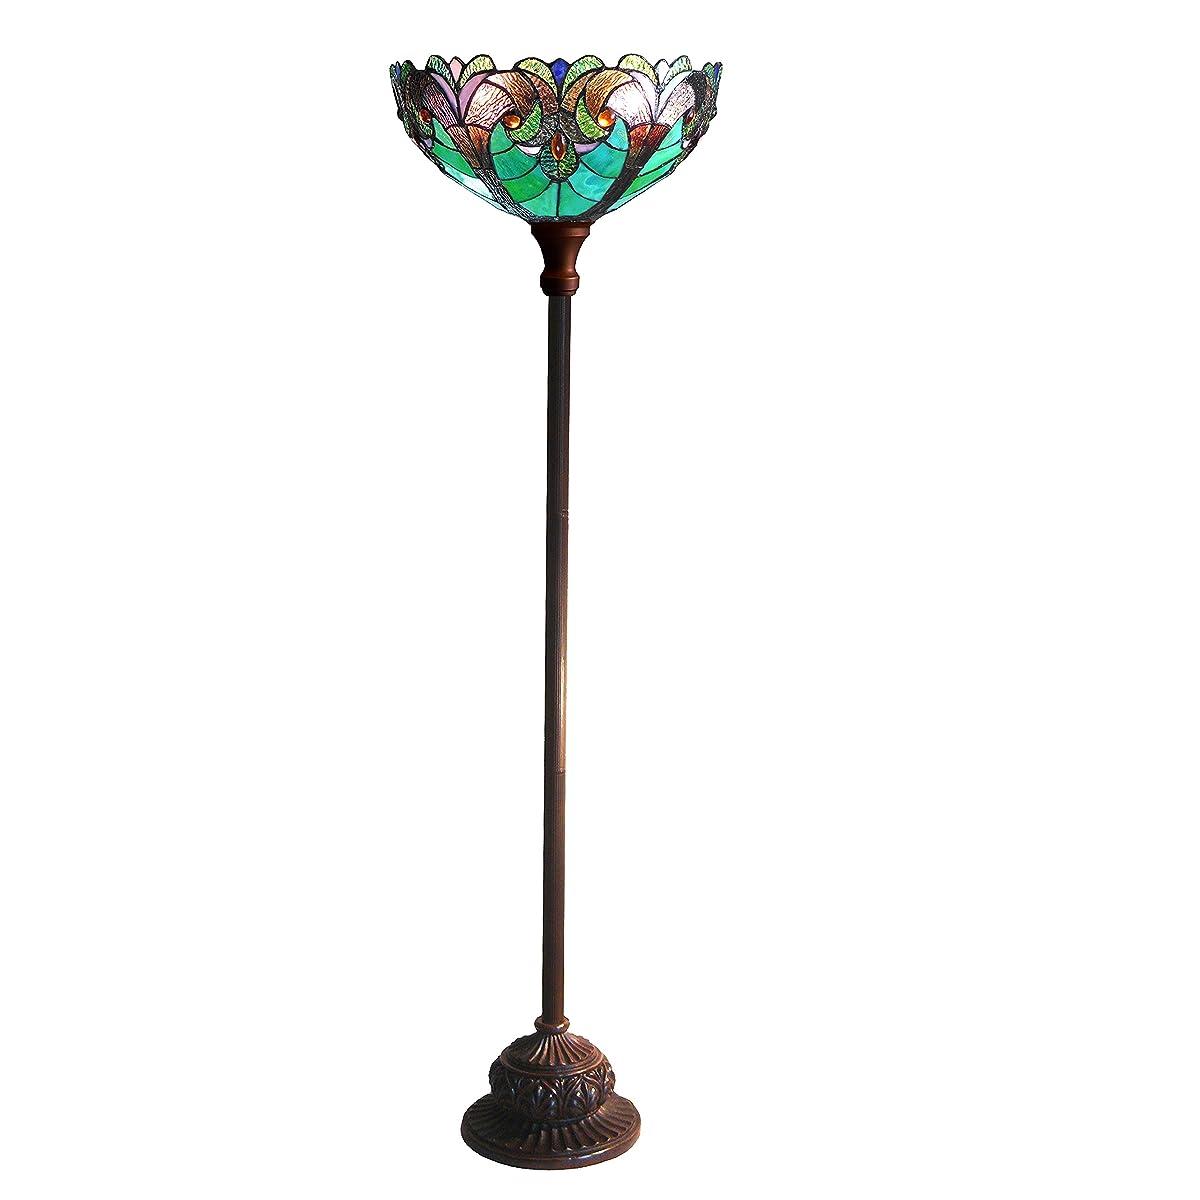 "Chloe Lighting CH18780VG15-TF1 1 Light 15"" Shade Liaison Tiffany-Style Victorian Torchiere Floor Lamp"